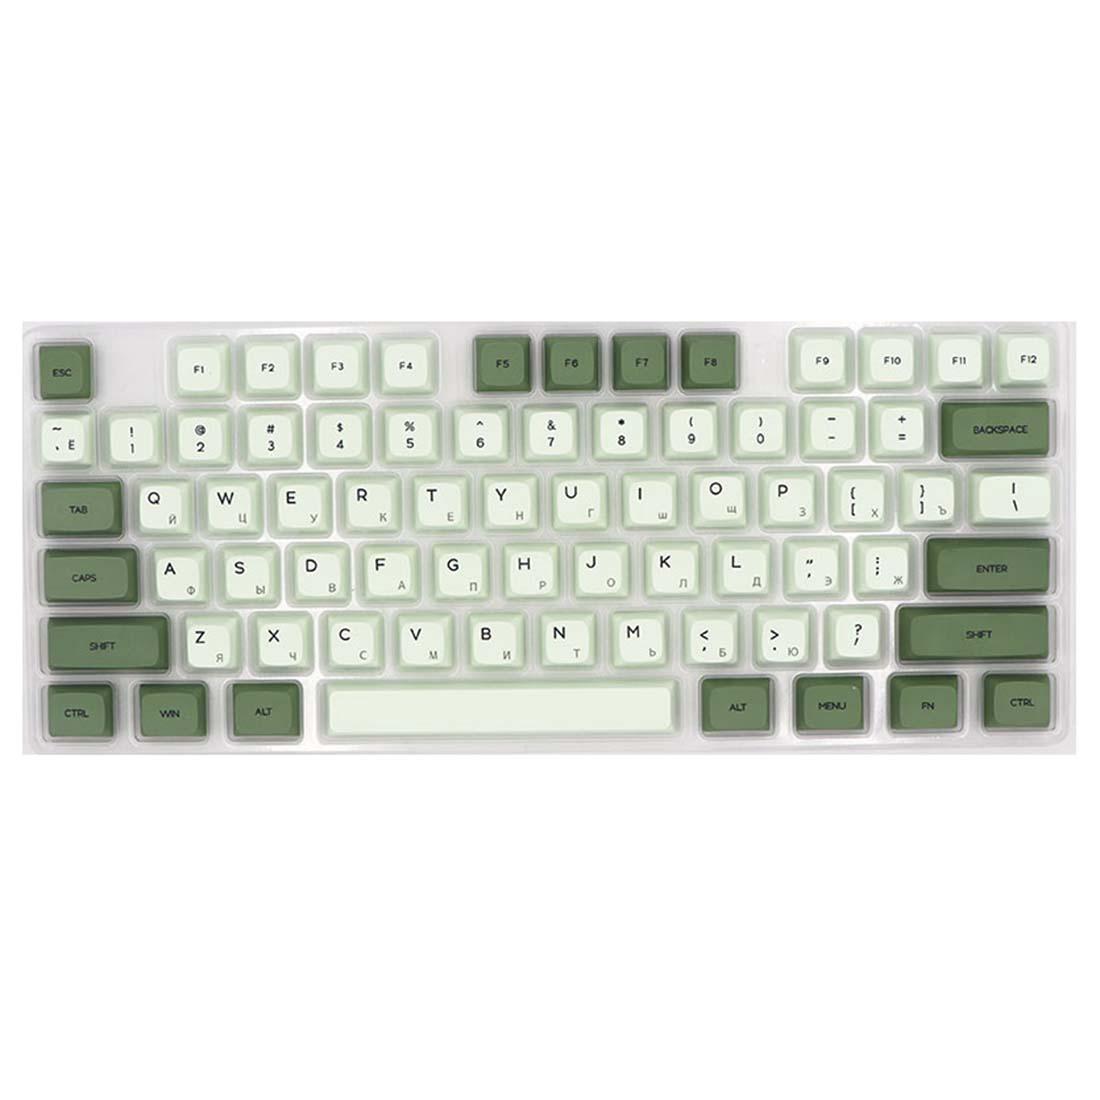 124Pcs Matcha PBT Dye-sub Keycaps with Puller for 61/64/87/96/104 Key GH60 RK61 Annie Pro Joke Custom Mechanical Gaming Keyboard - Russian Radical